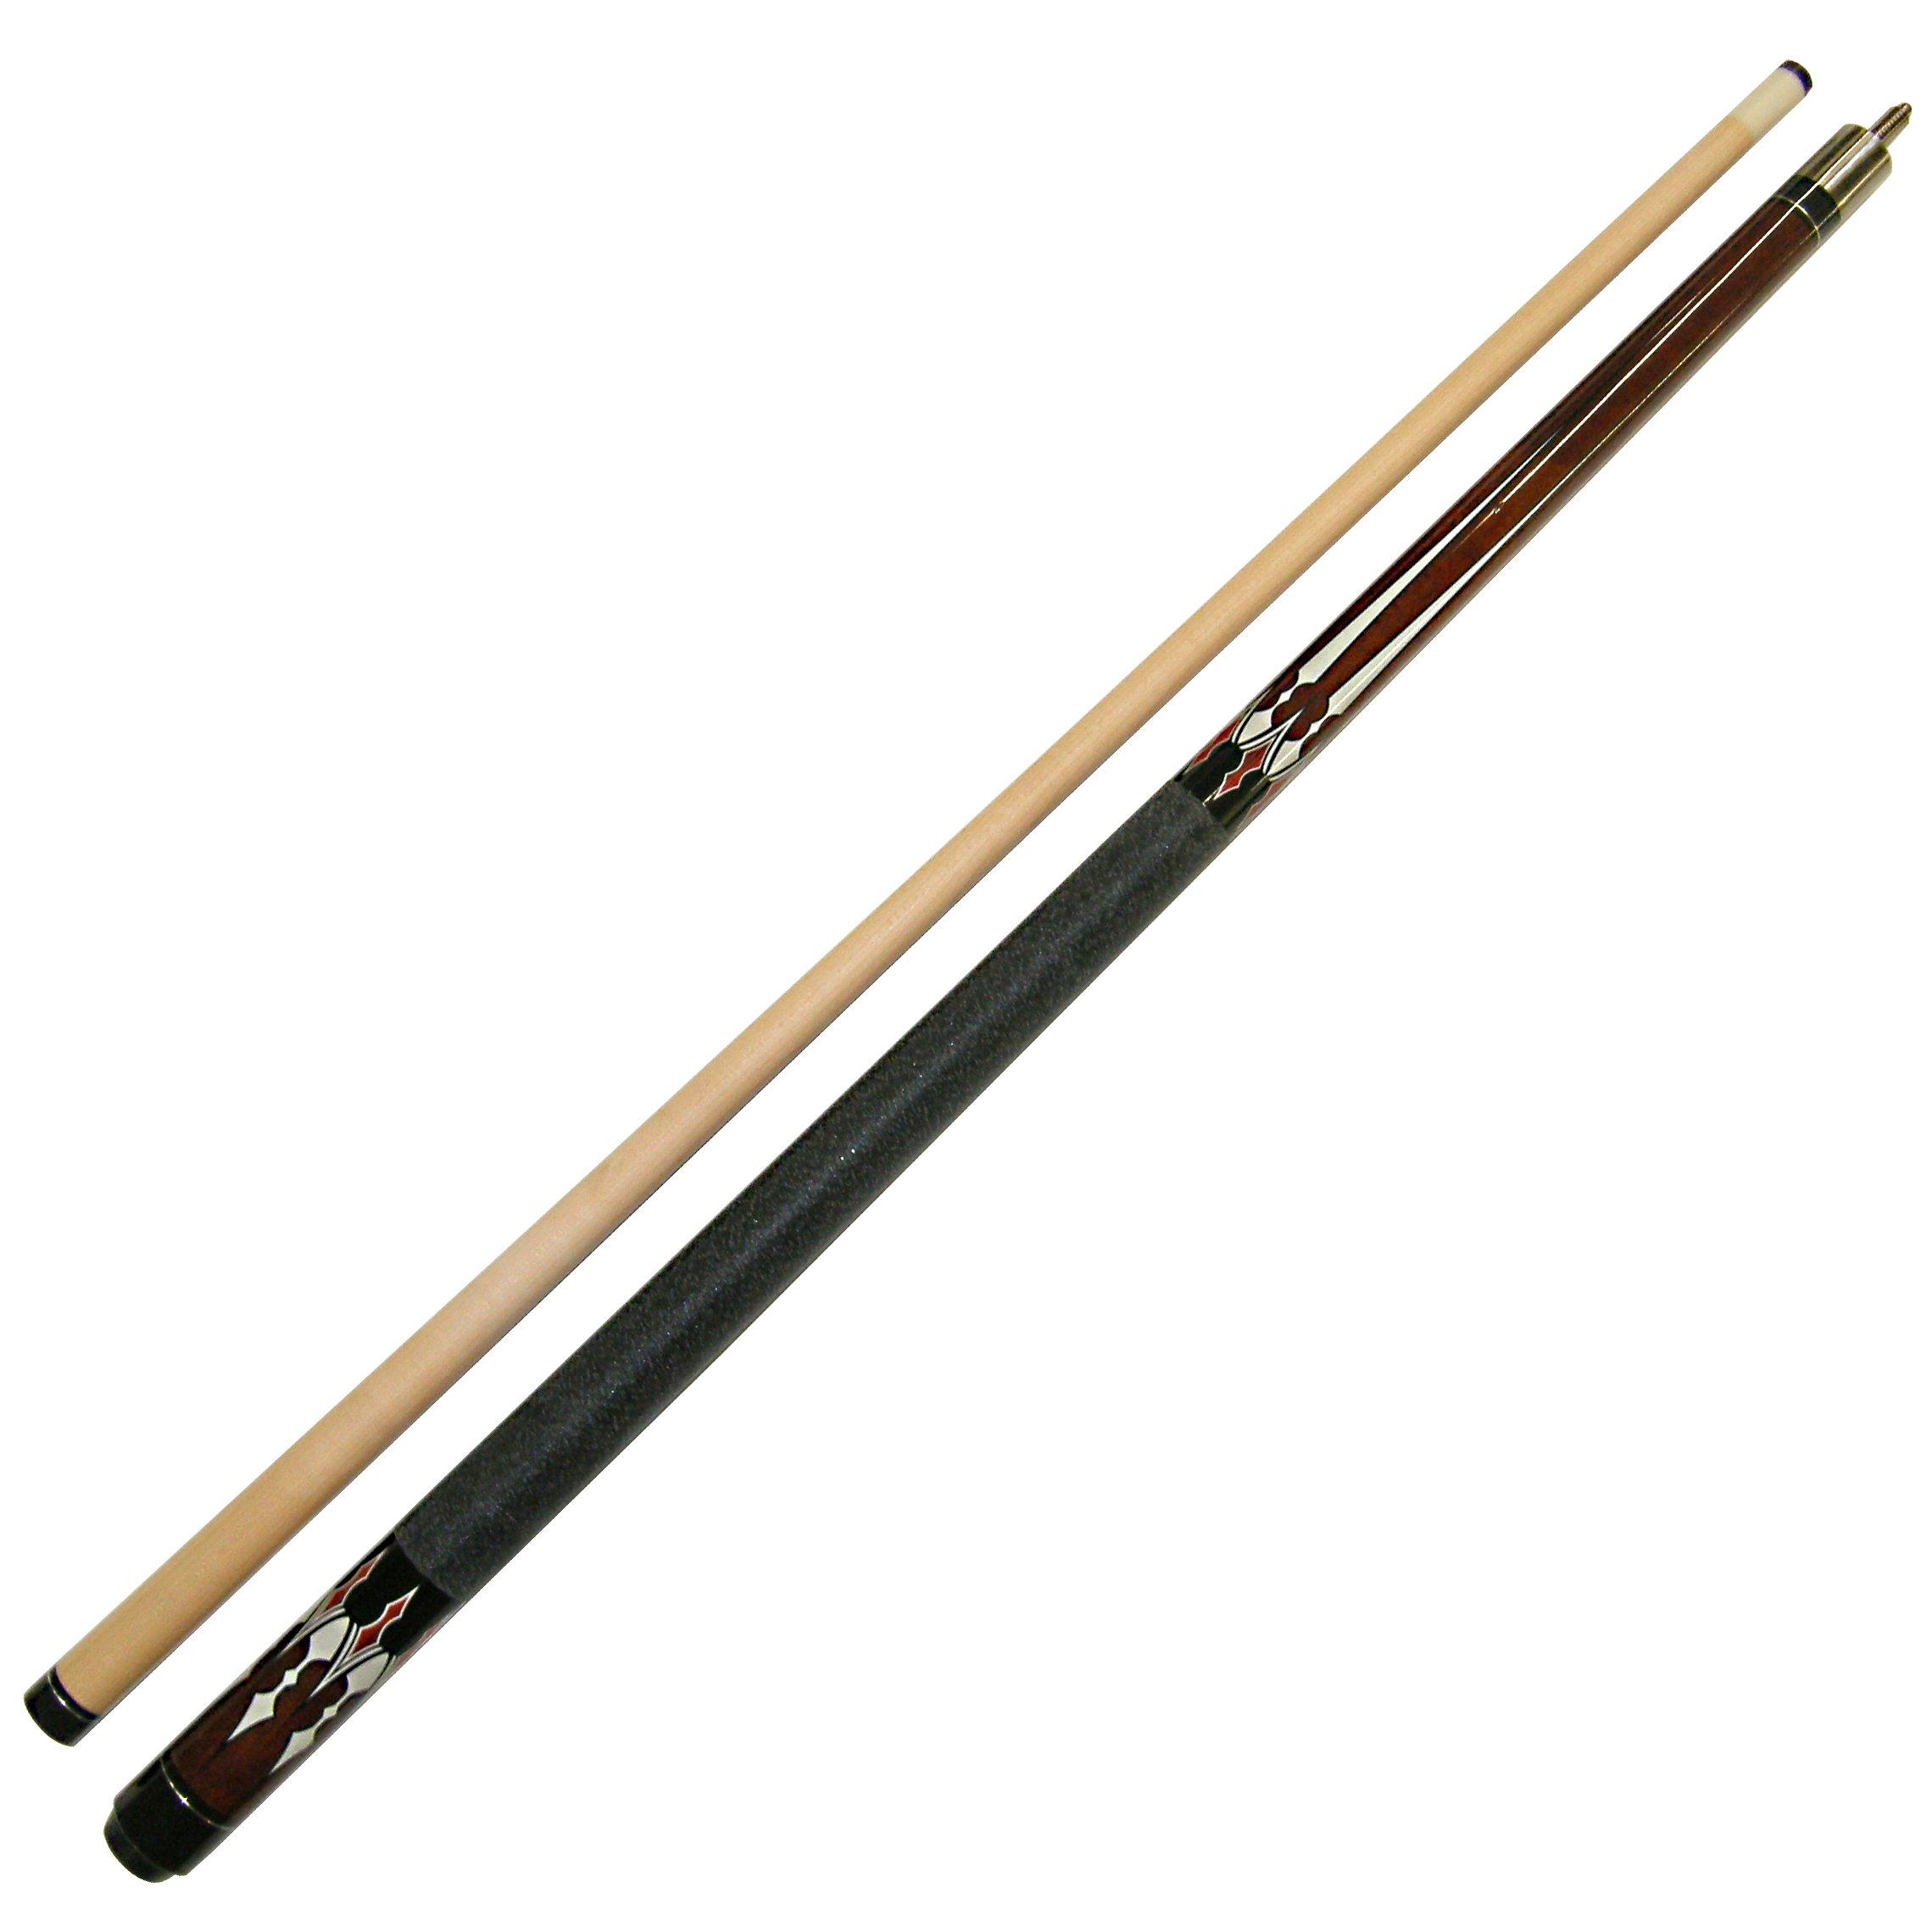 "58/"" Billiard Stick Hardwood Canadian Maple 23 Ounce Red 2 Pce Break Pool Cue"